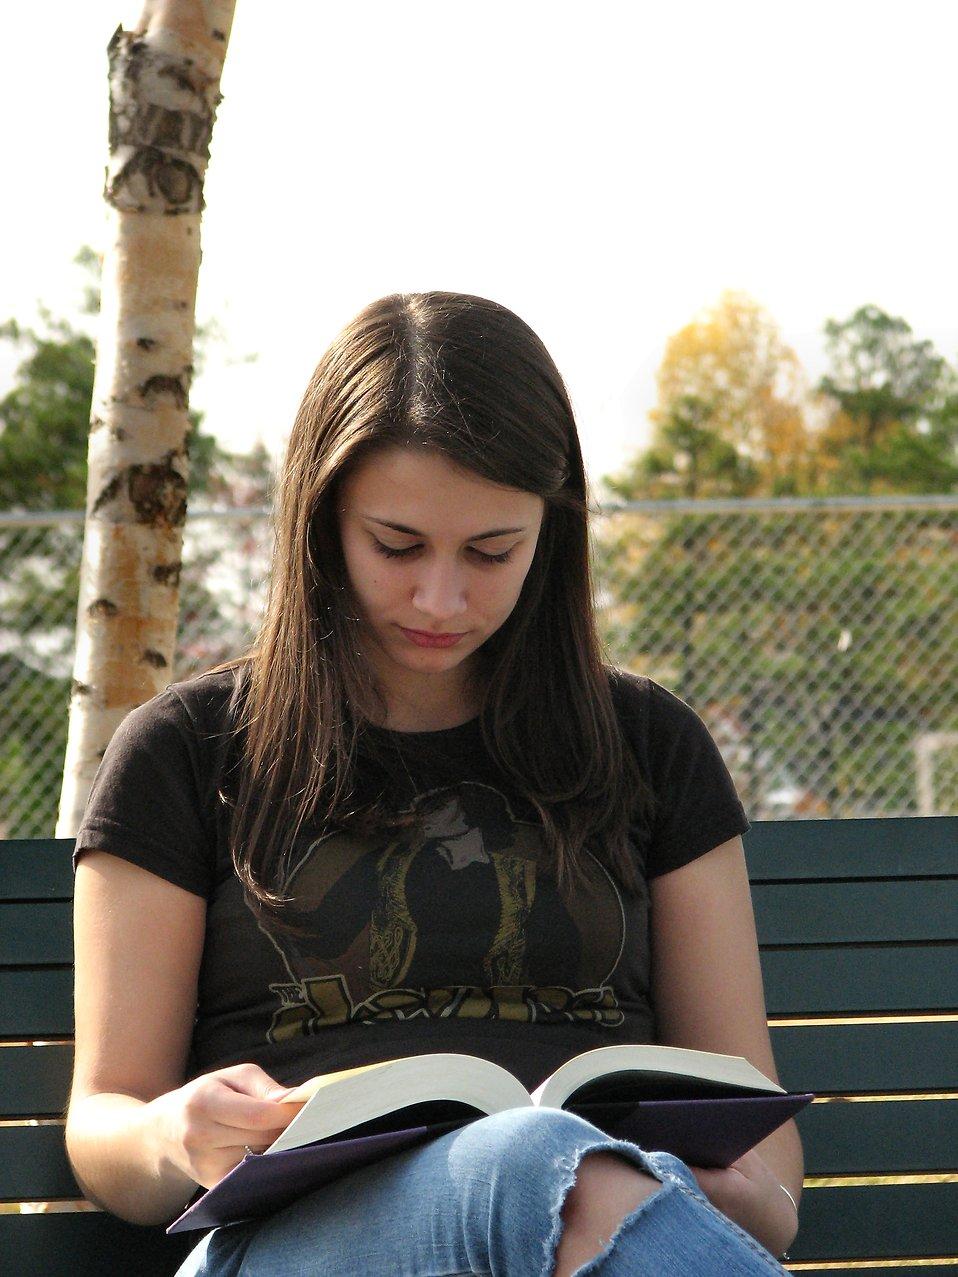 Closeup of teenage girl reading a book : Free Stock Photo